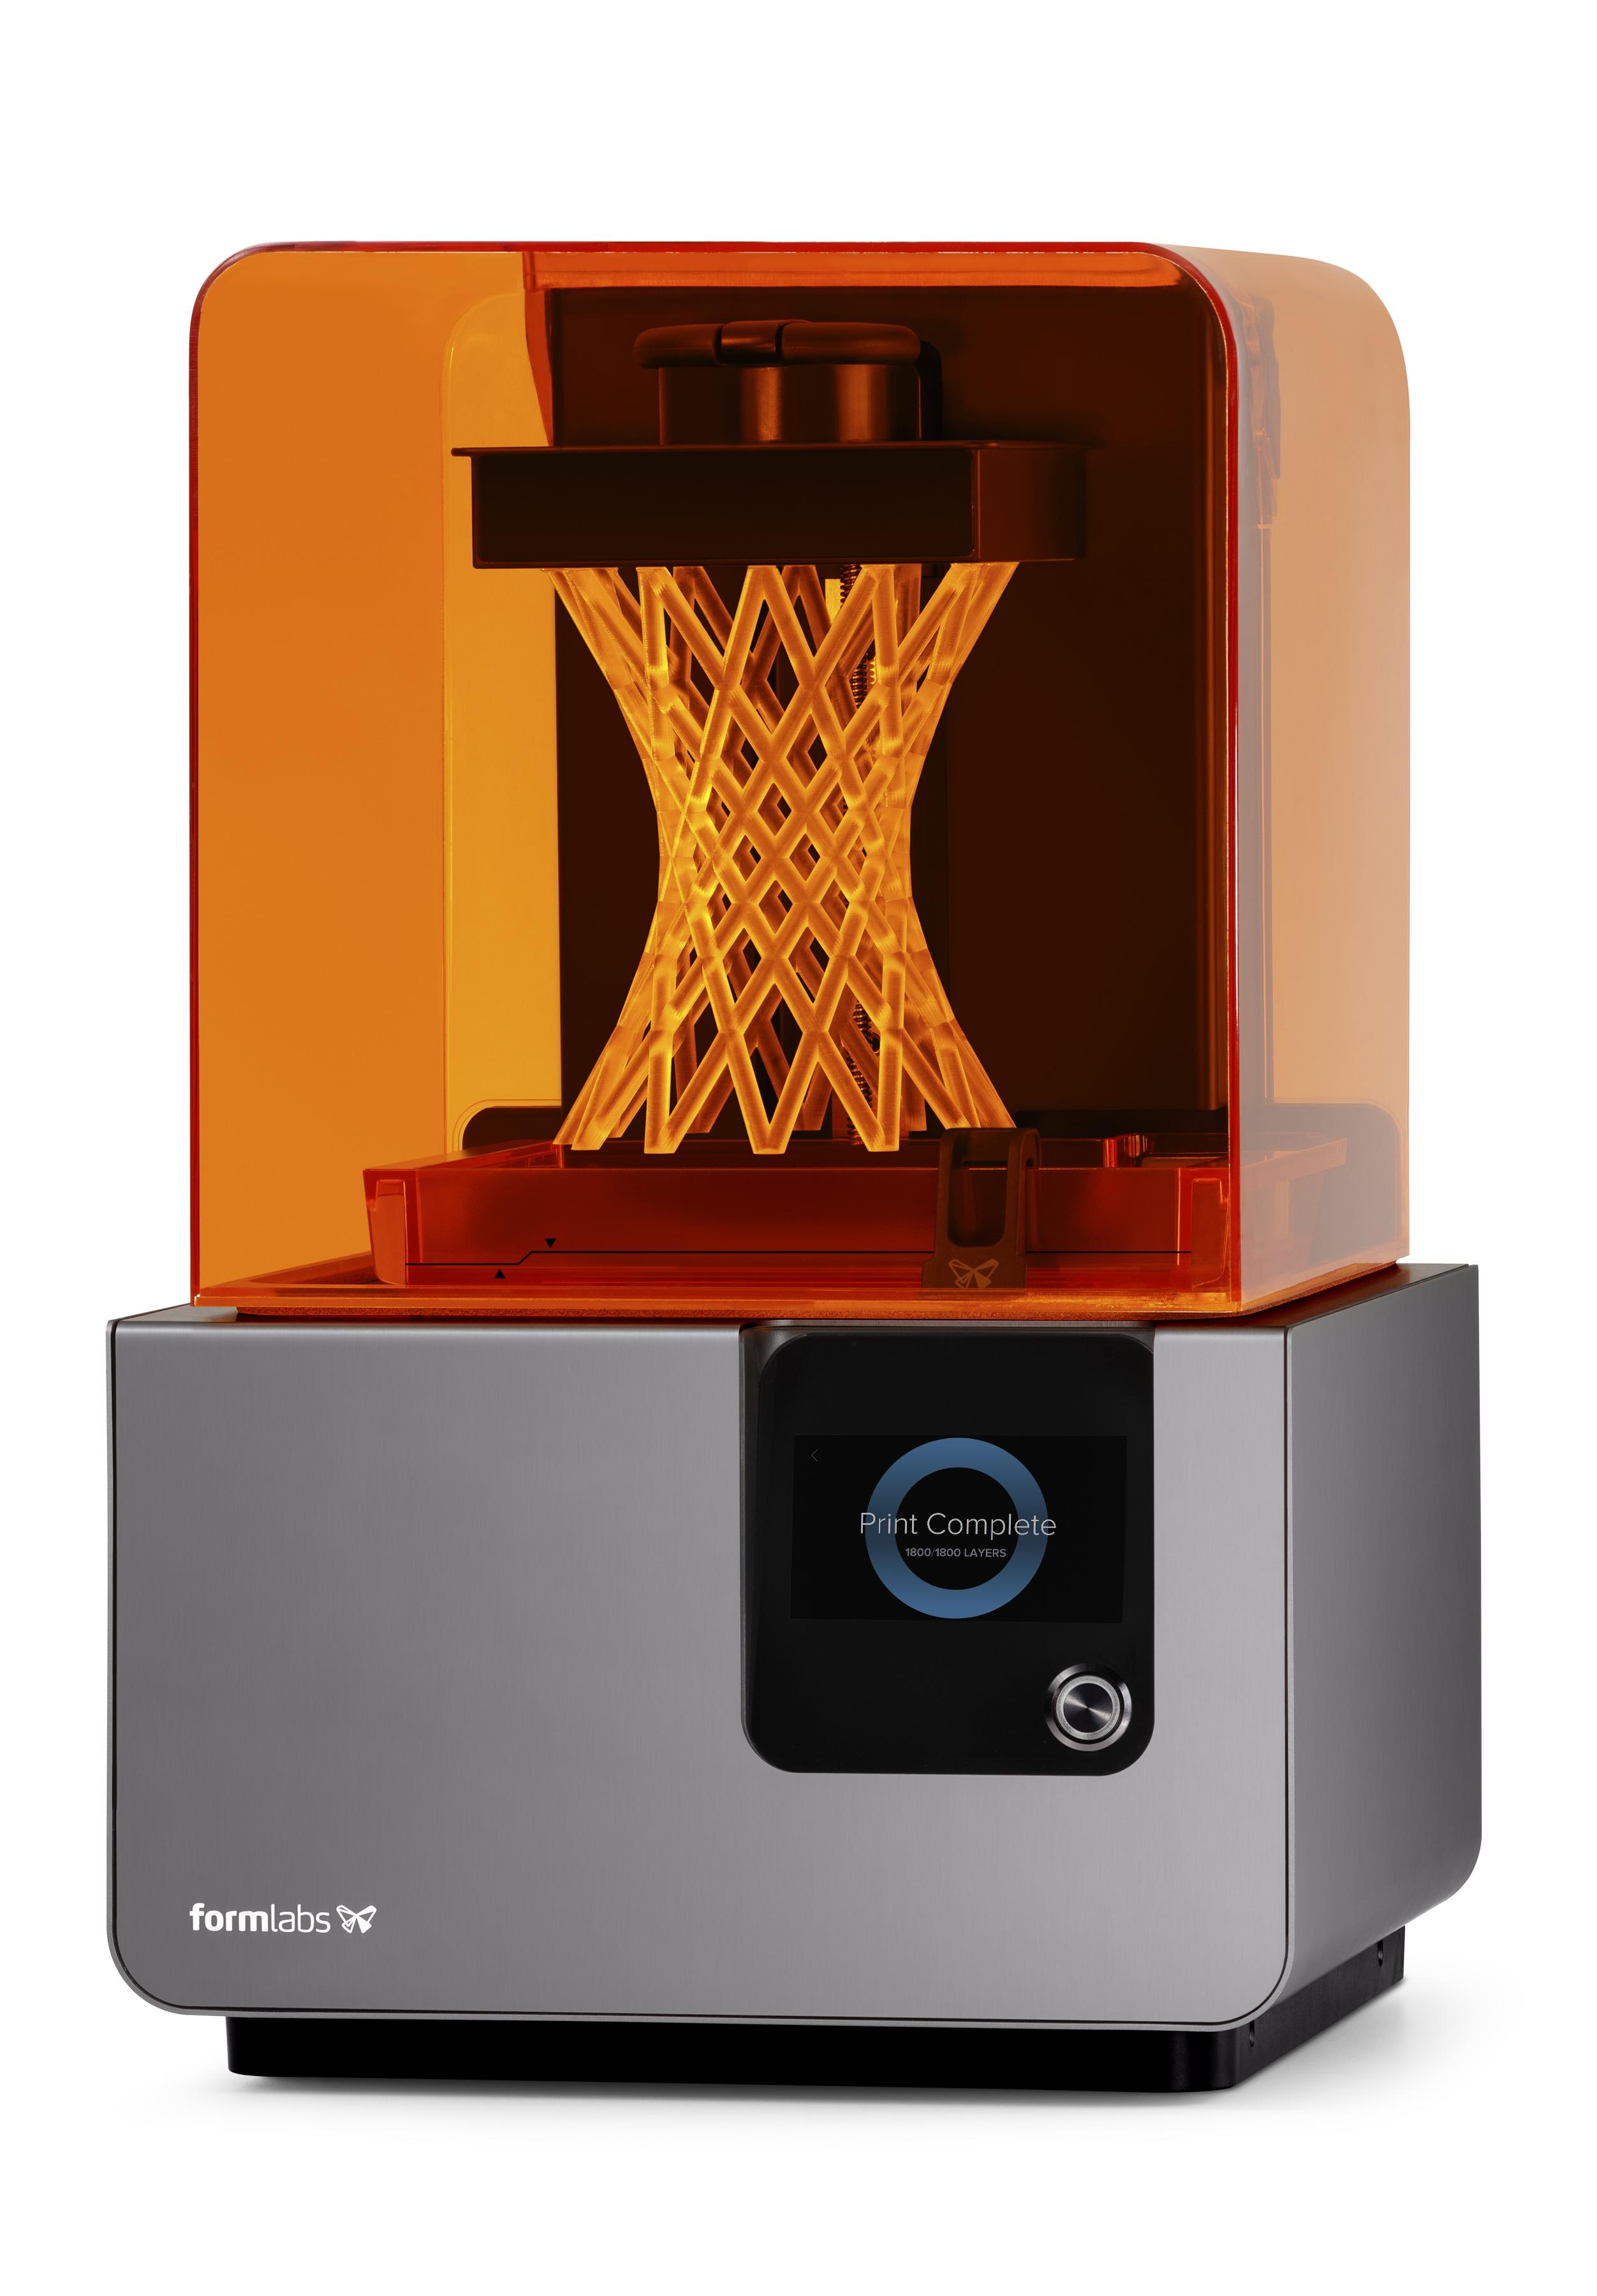 Form Labs new 3D printer